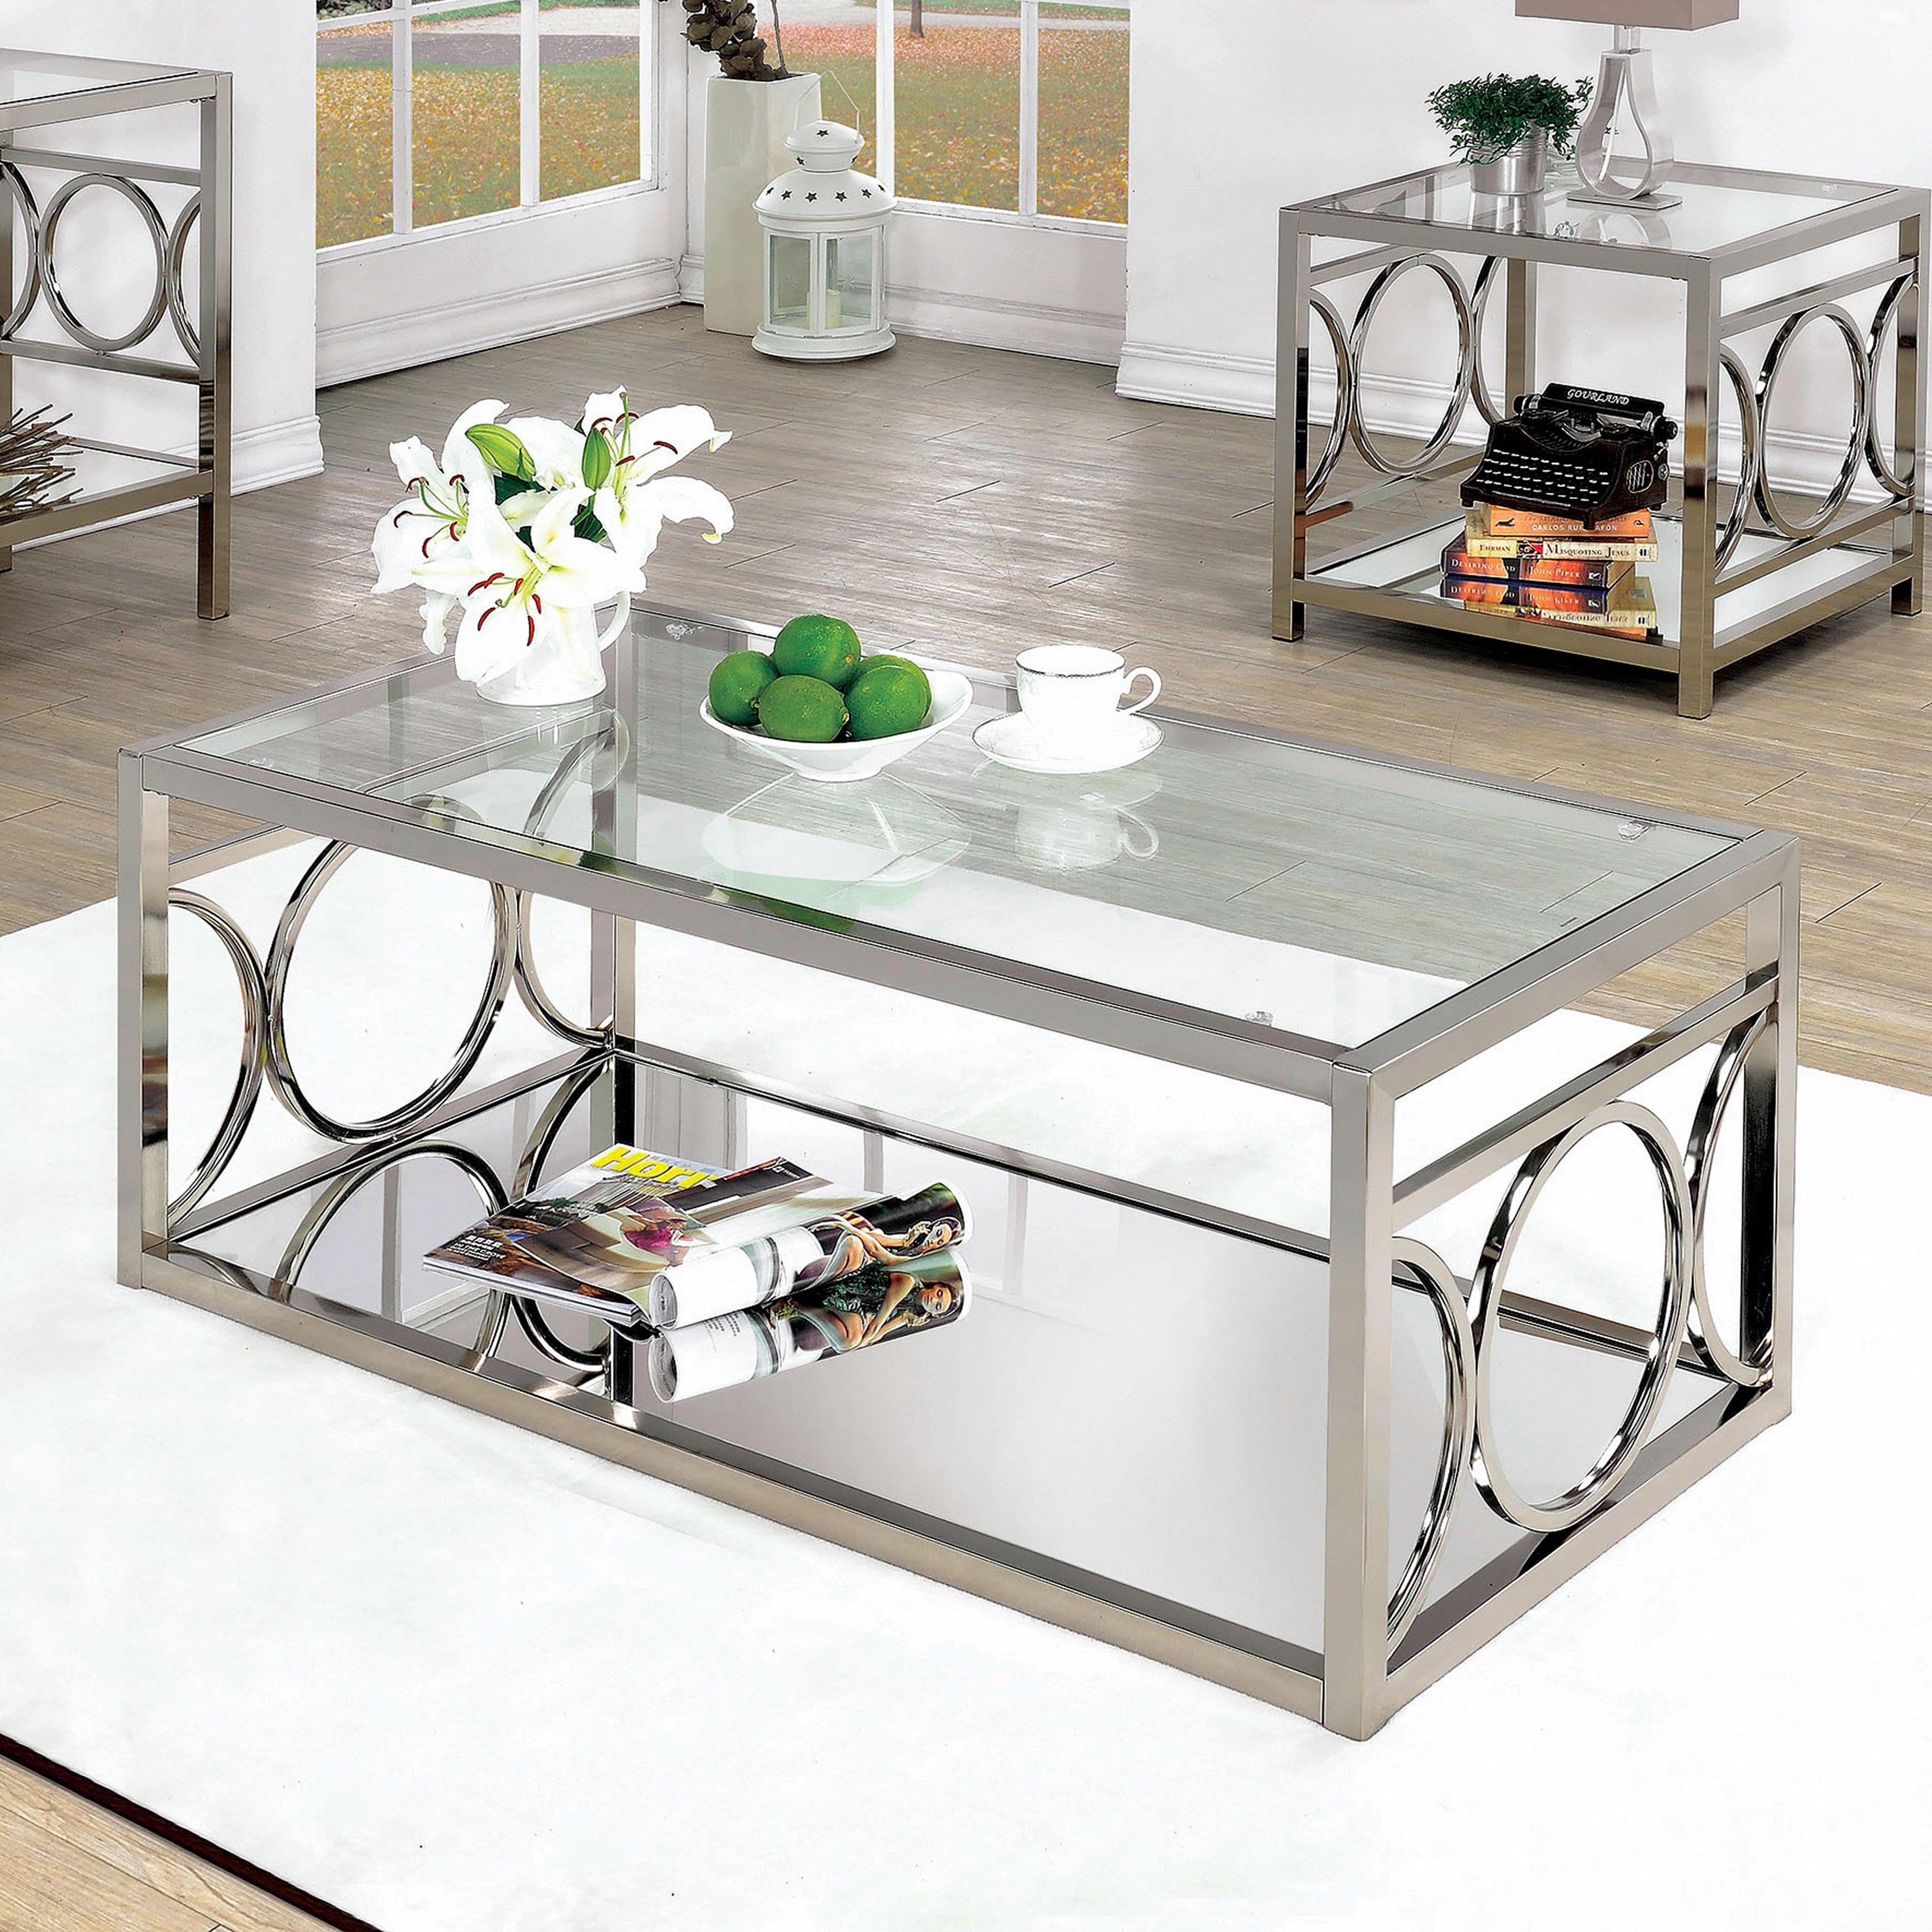 Coffee Table Sets At Wayfair: Mercer41 Spacek O-Ring Panel Coffee Table & Reviews